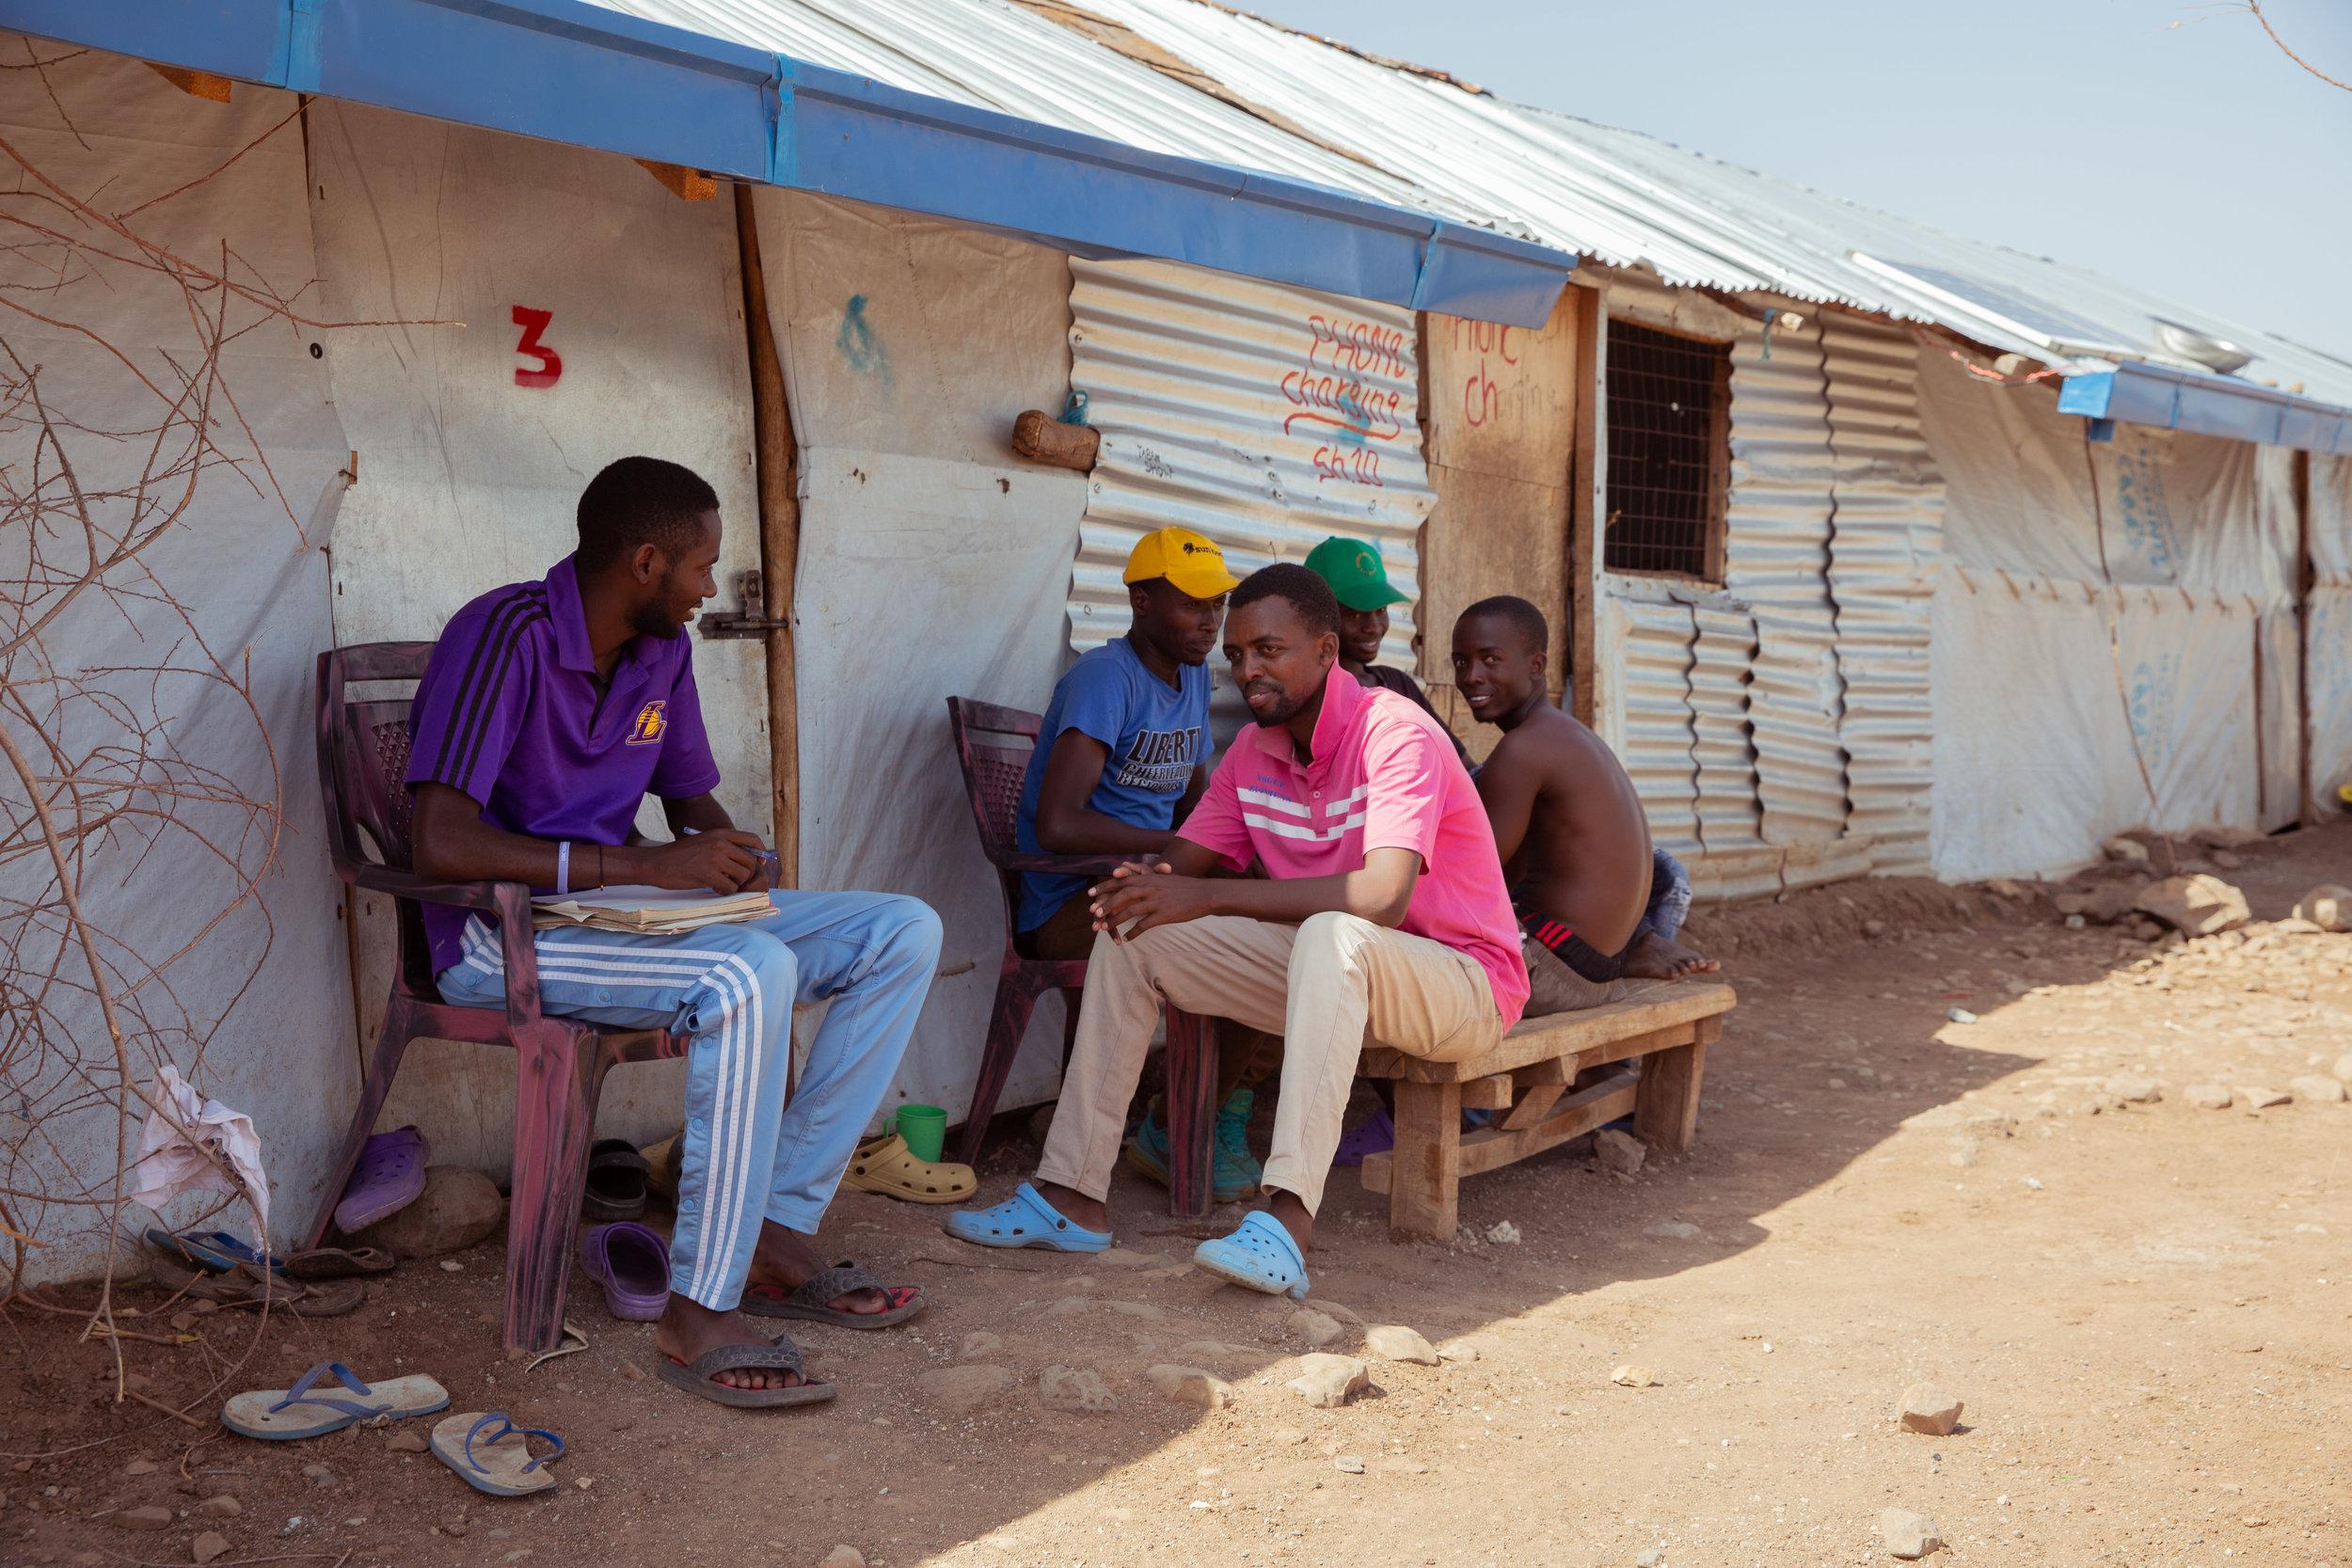 08_KLABU Campaign image _ by Coco Olakunle.jpg